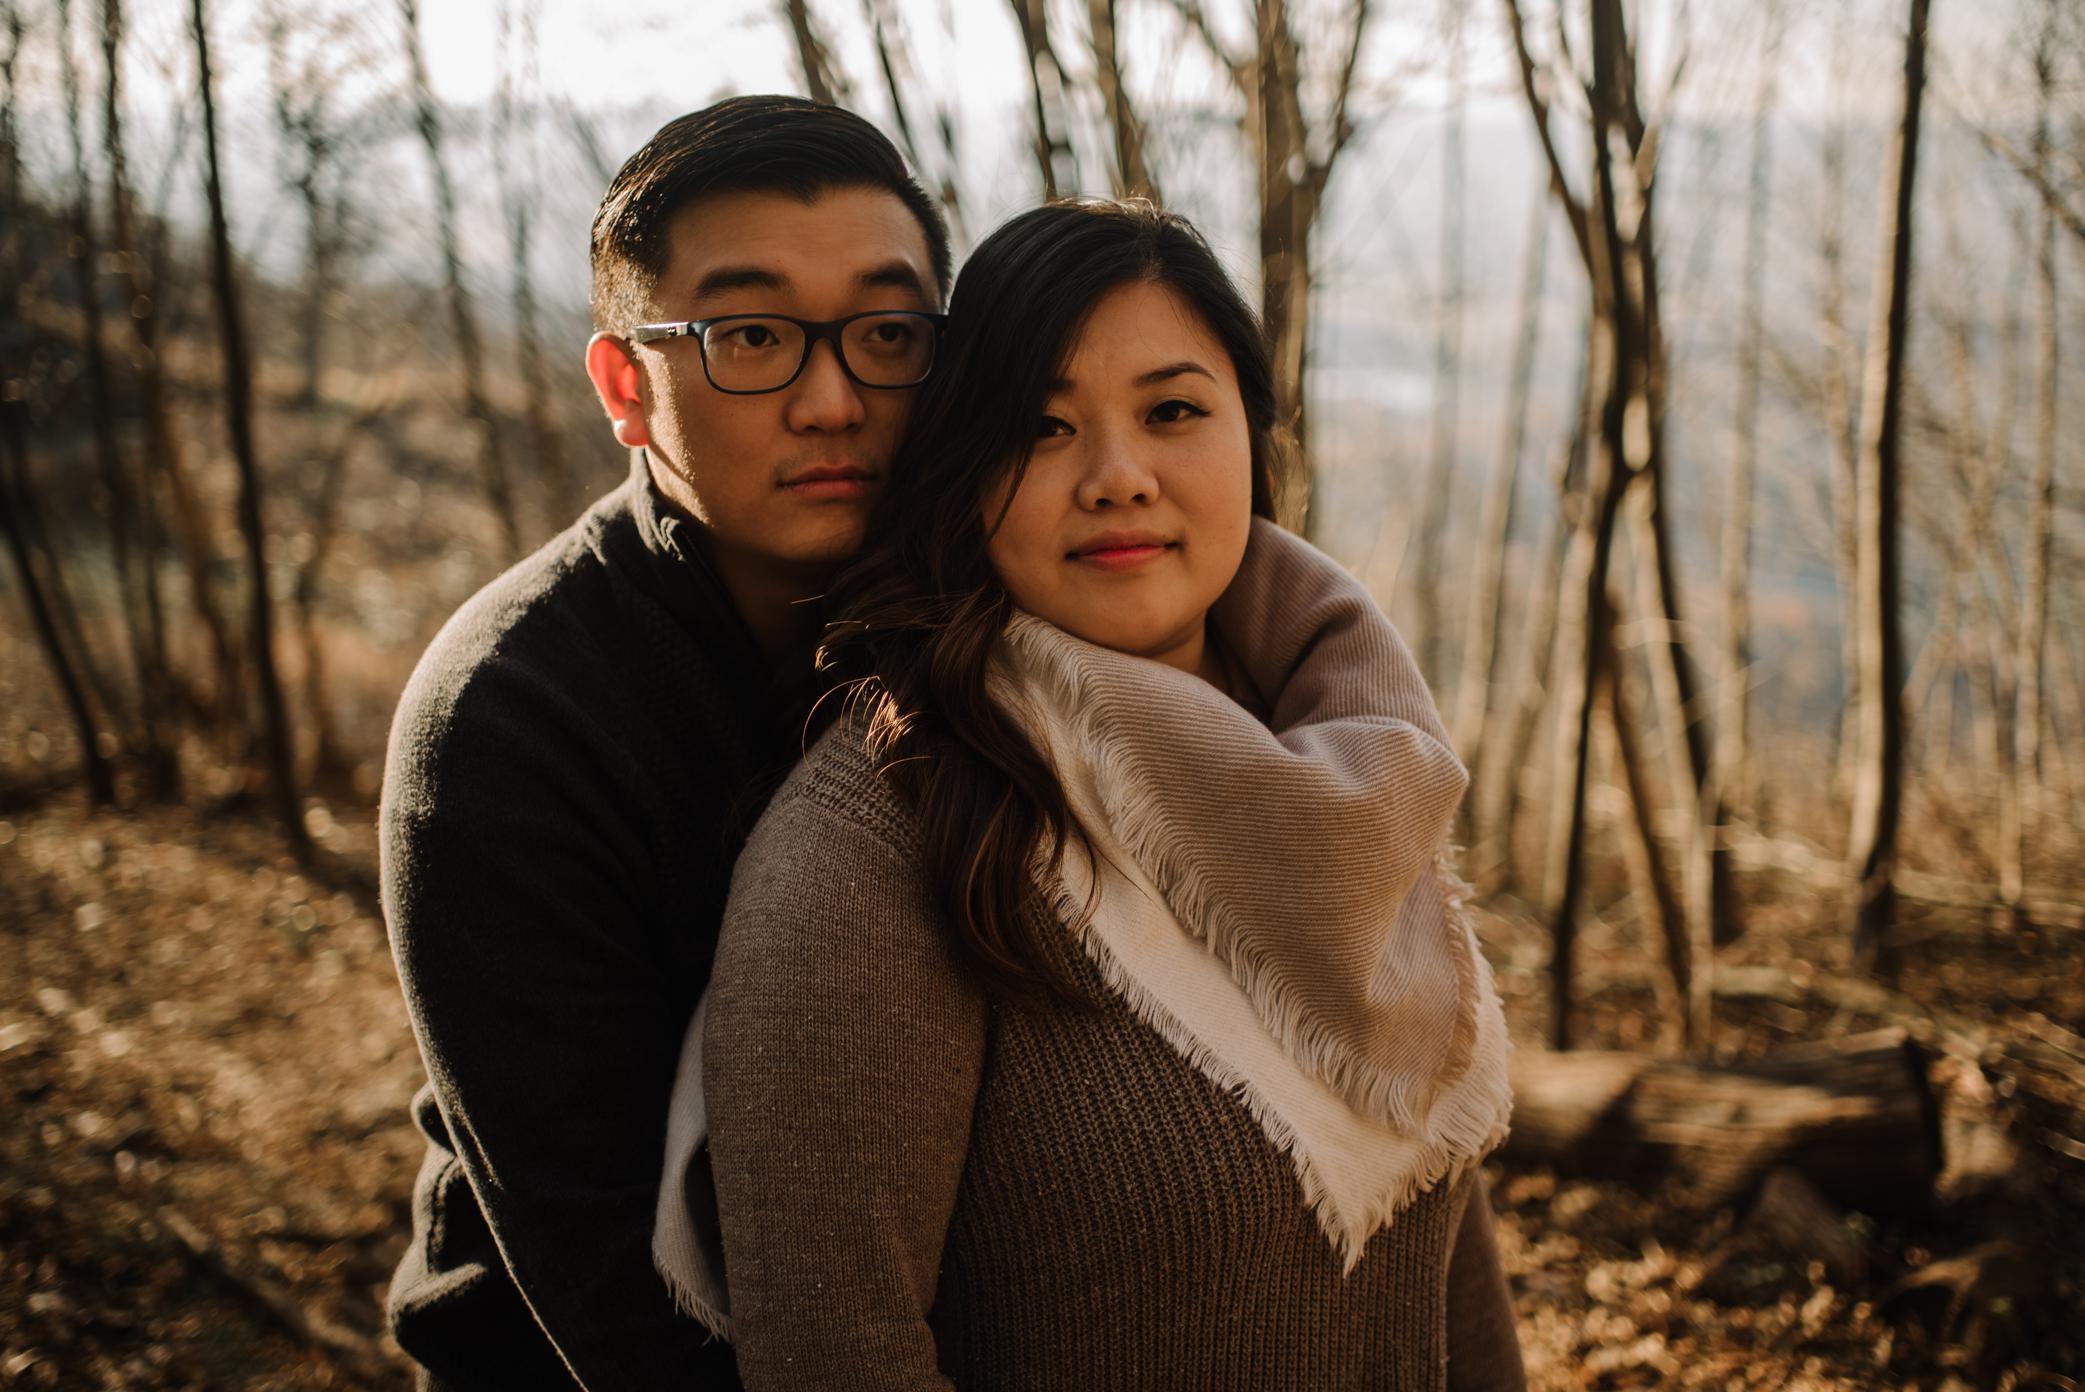 Joshua and Kristina - Shenandoah National Park - Skyline Drive - Winter Engagement Session Photographer - White Sails Creative_7.JPG